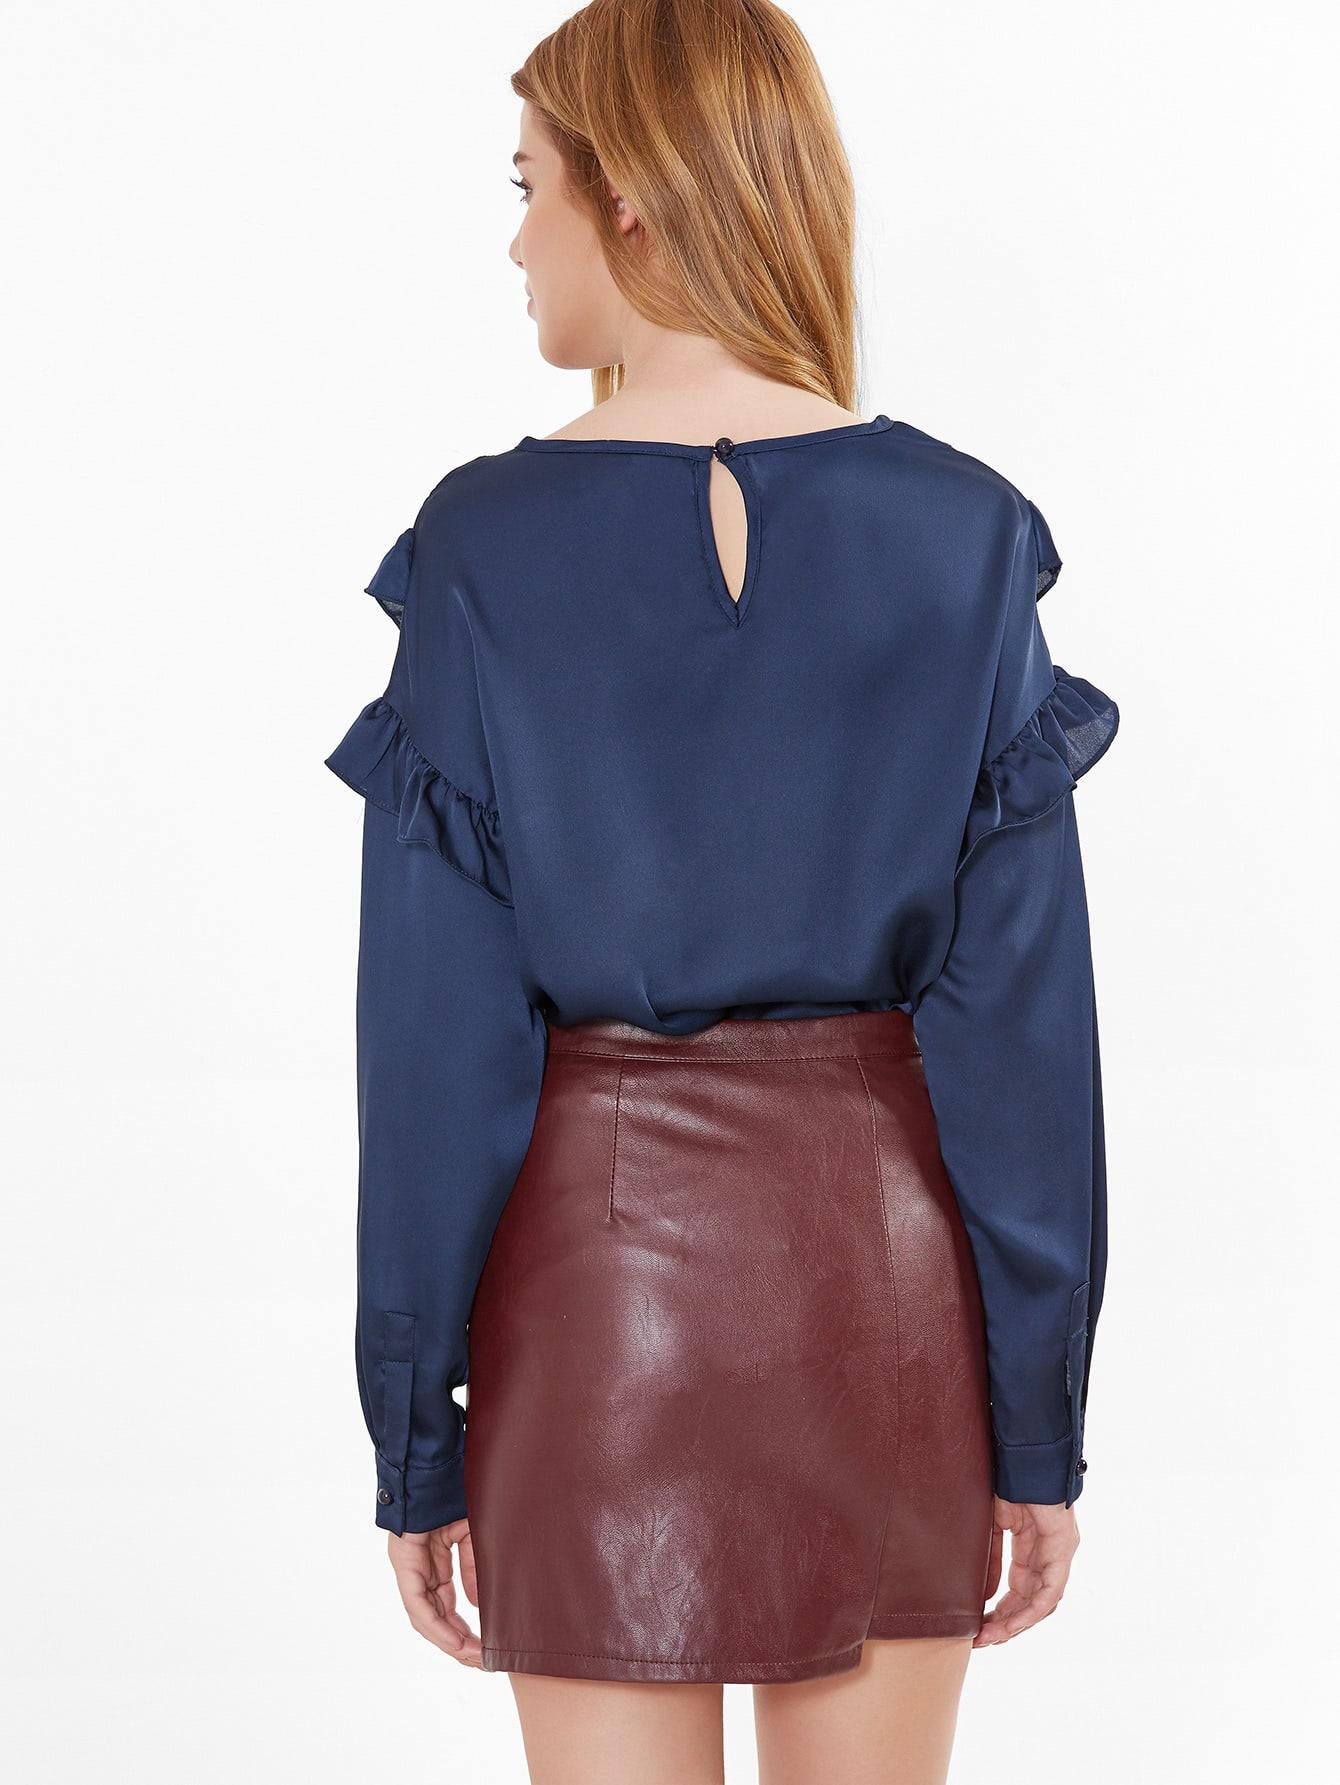 blouse160912703_2